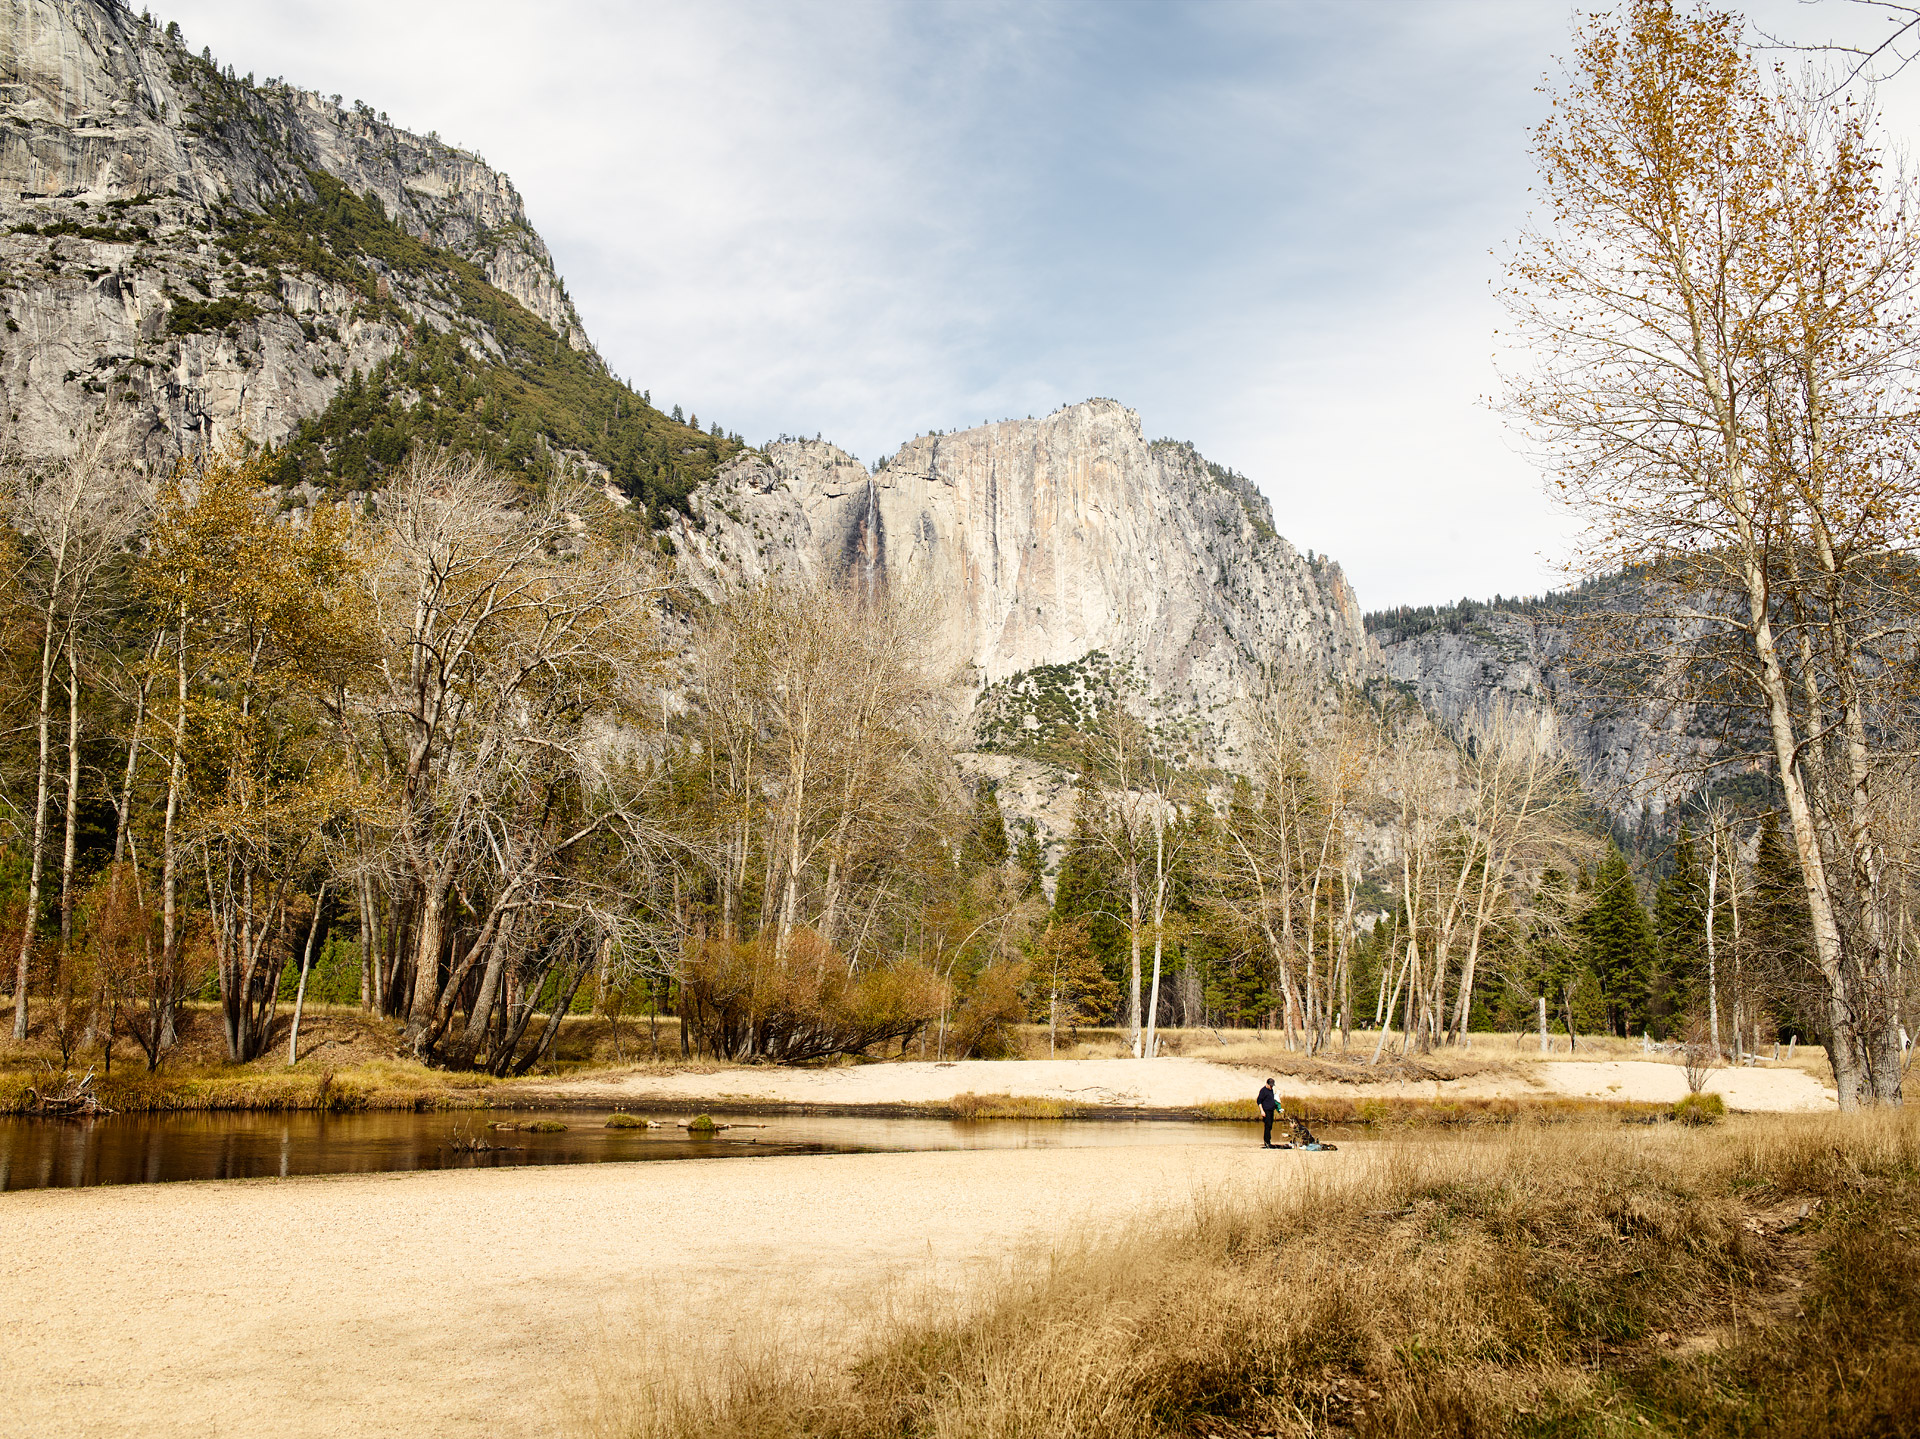 Yosemite_CF006408